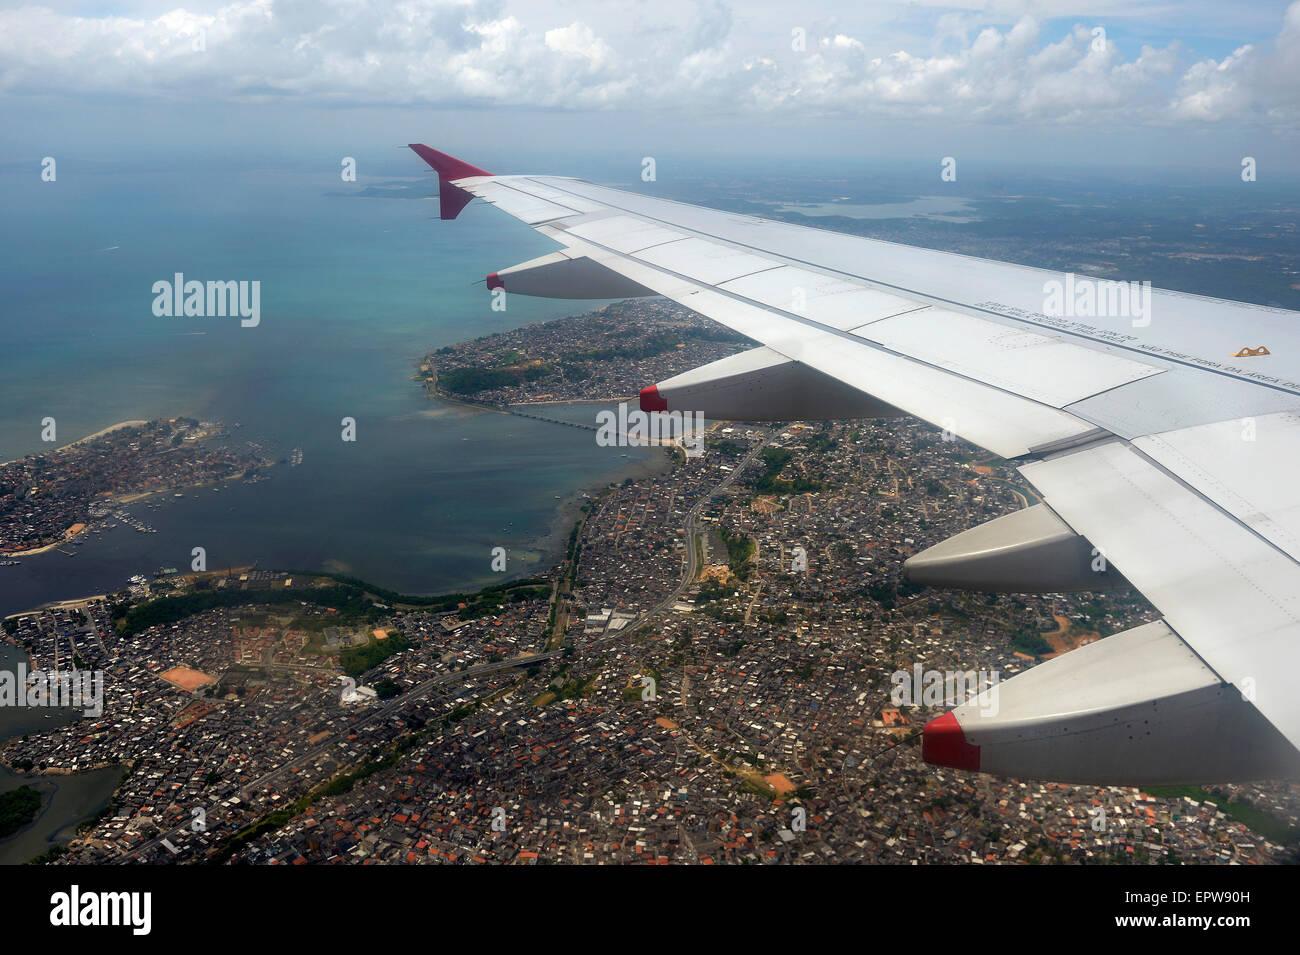 Aerial view with airplane wing, landing at Salvador de Bahia, Bahia, Brazil - Stock Image